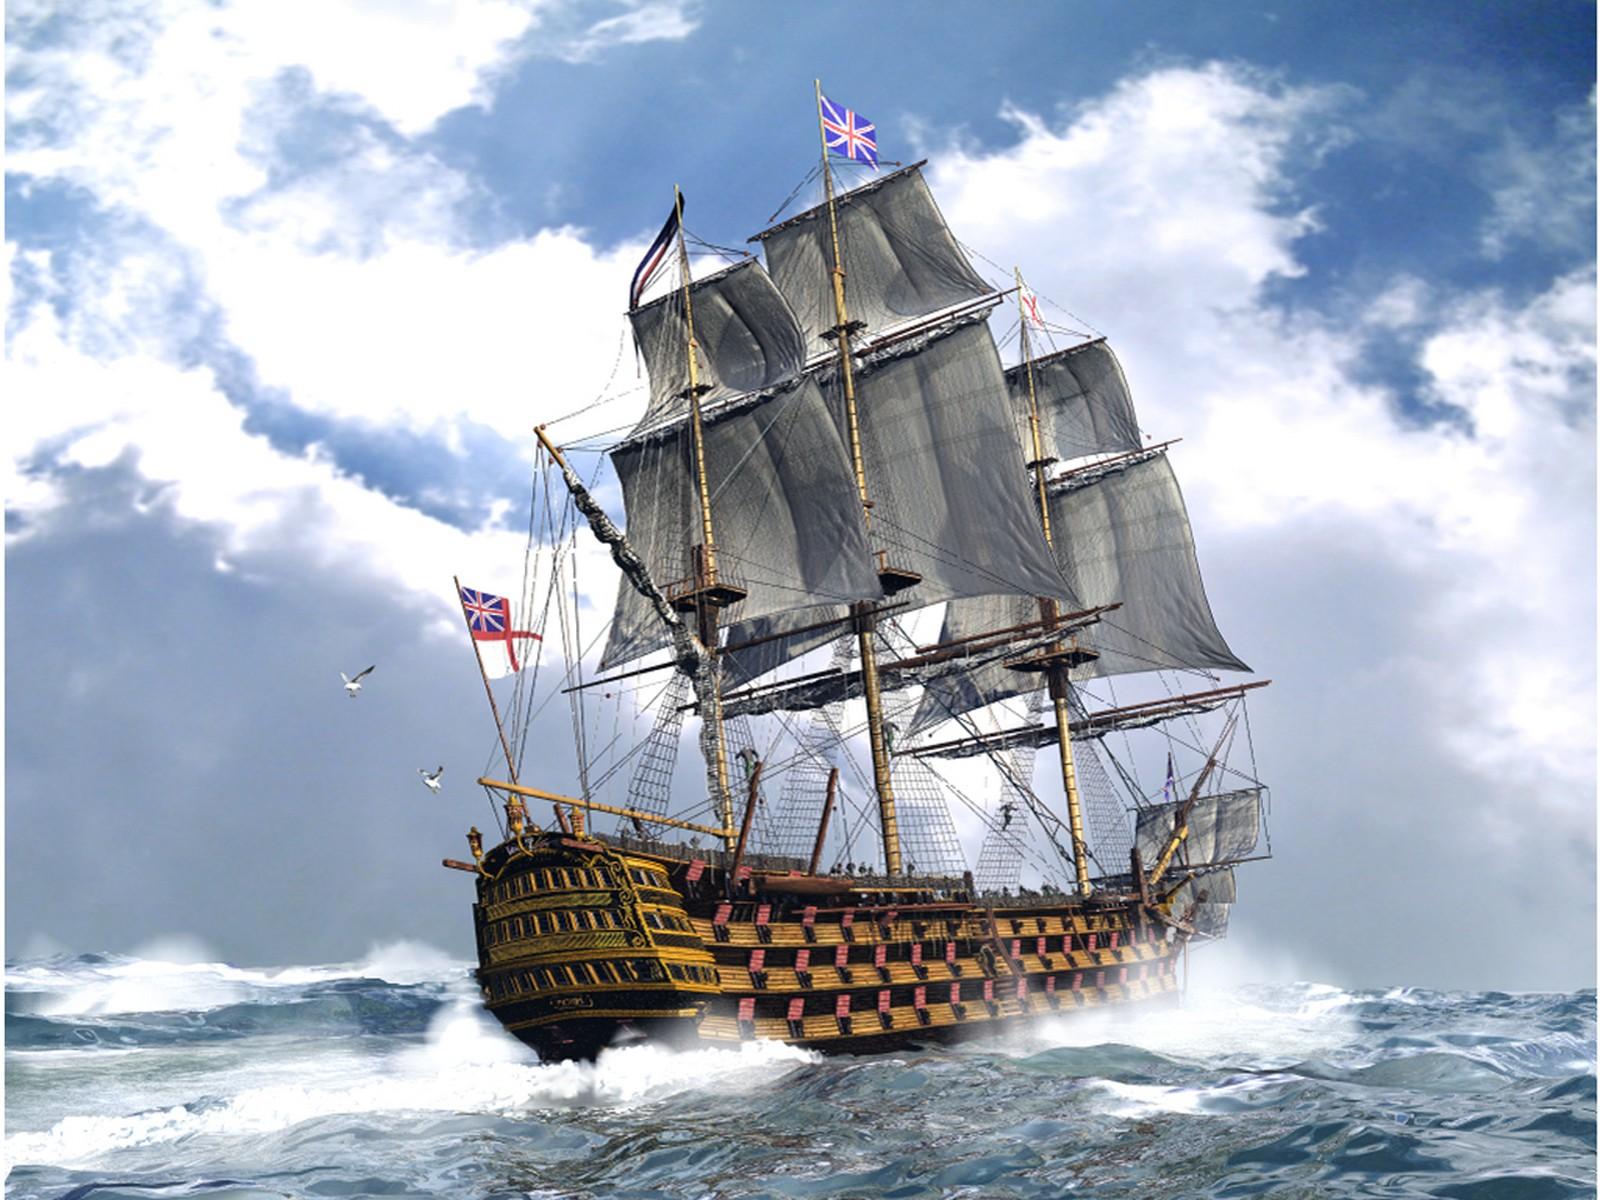 General 1600x1200 England sailing ship sea ship clouds vehicle artwork Man-of-war rigging (ship) military warship military vehicle